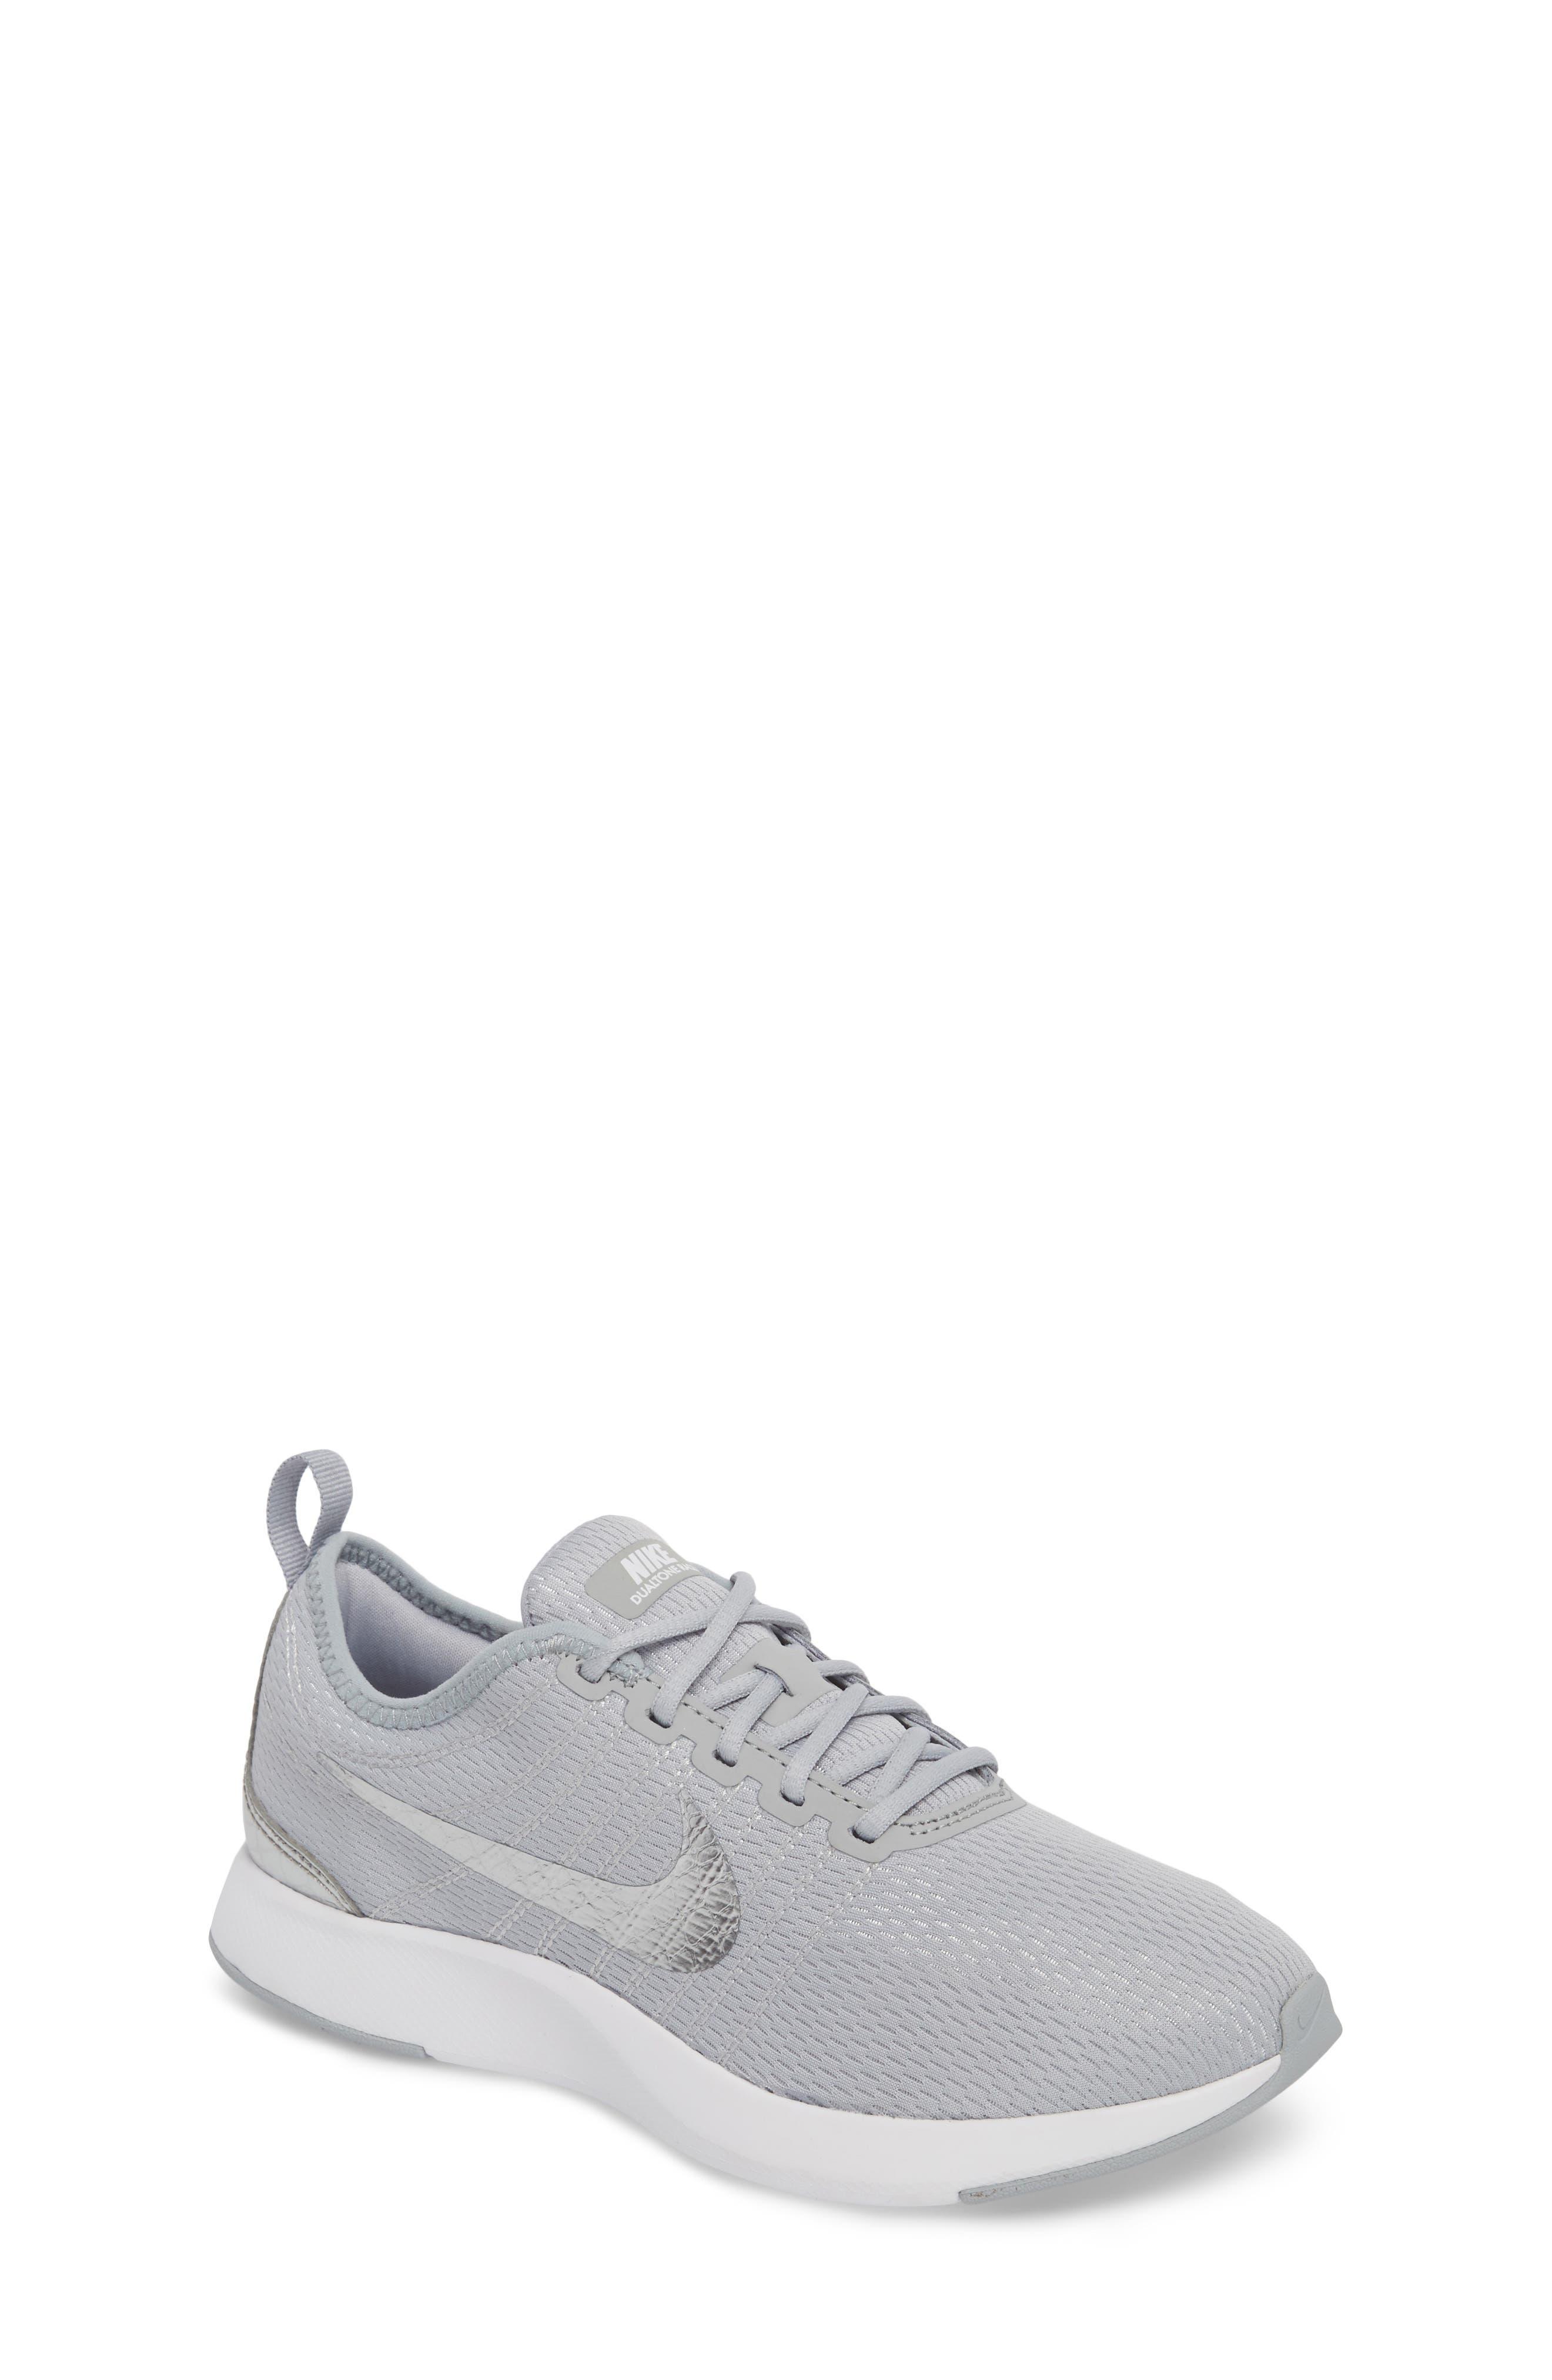 Dualtone Racer GS Sneaker,                         Main,                         color, Wolf Grey/ Metallic Silver